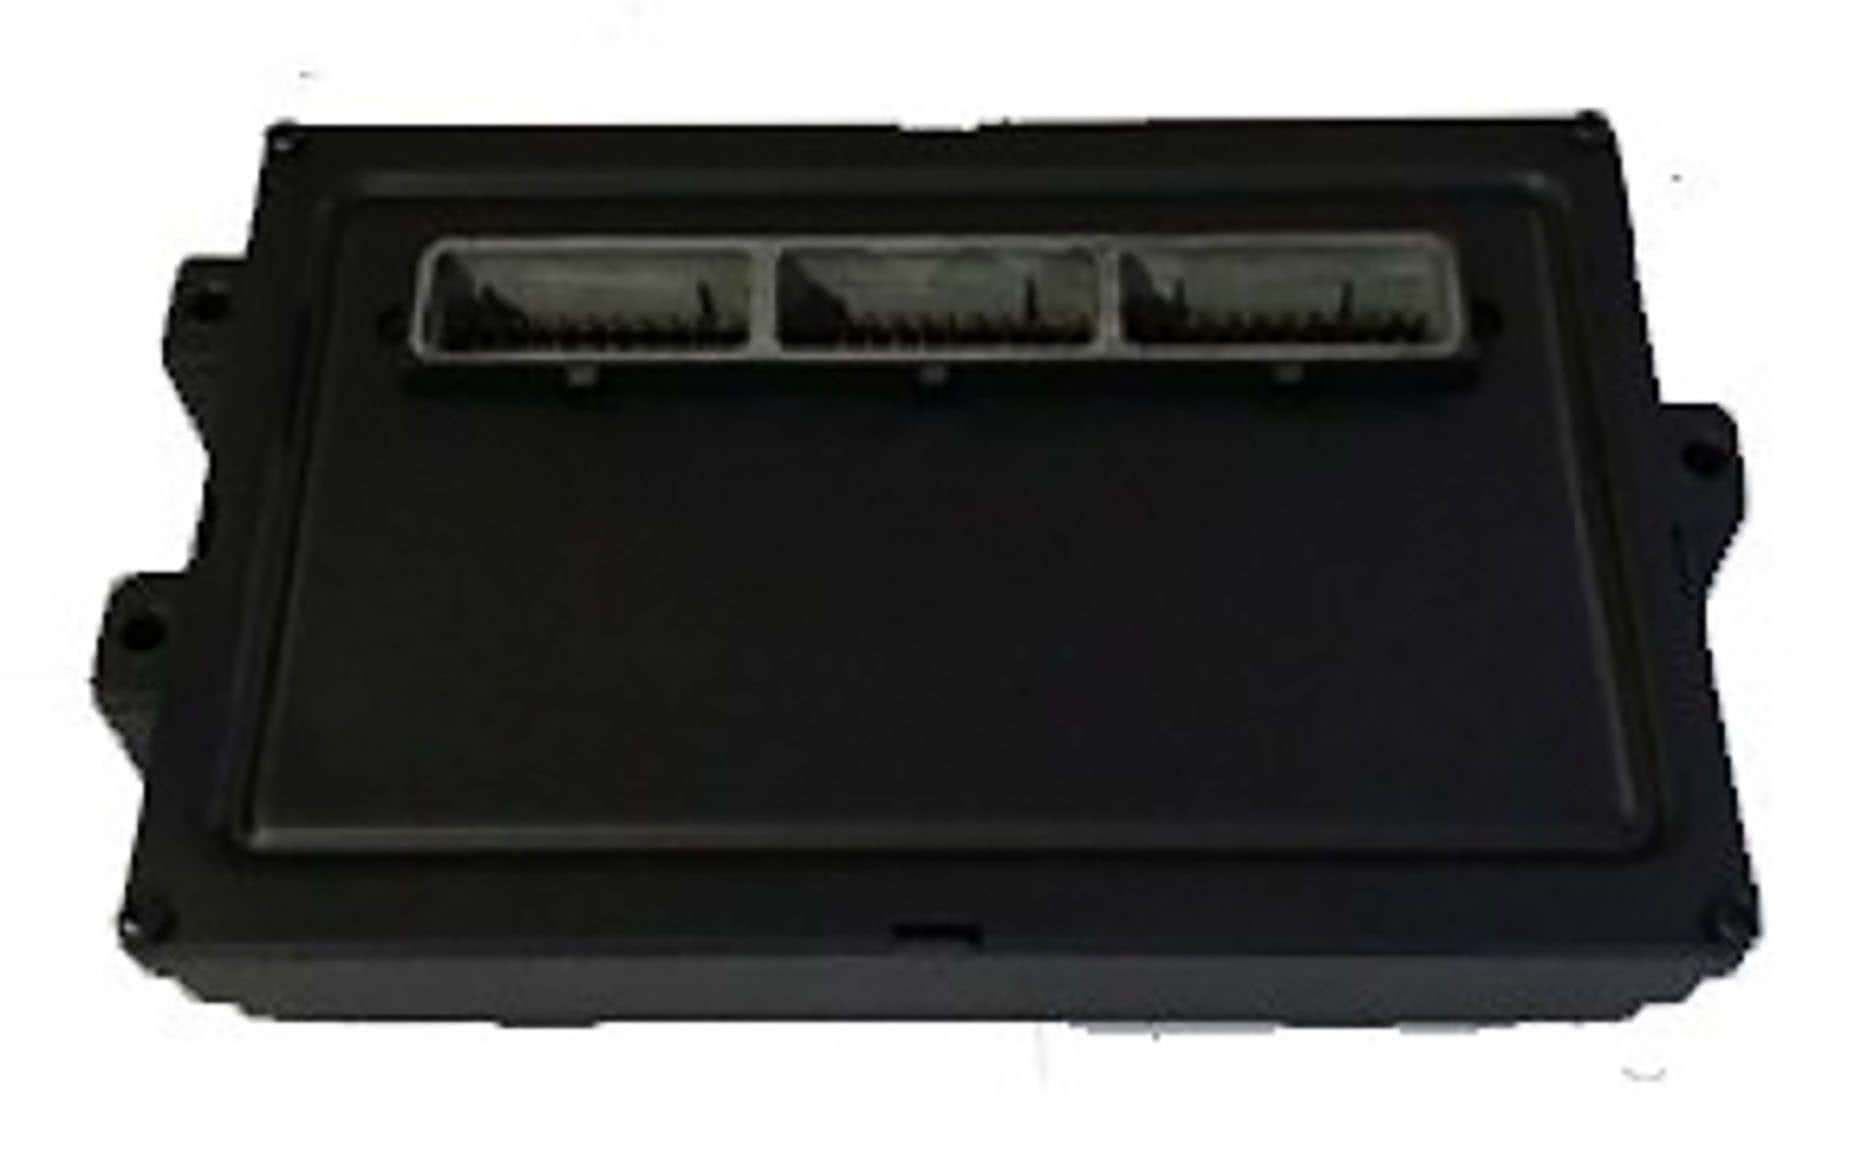 2002 Jeep Grand Cherokee 4.7L V8 Gas PCM / ECU / ECM Engine Computer